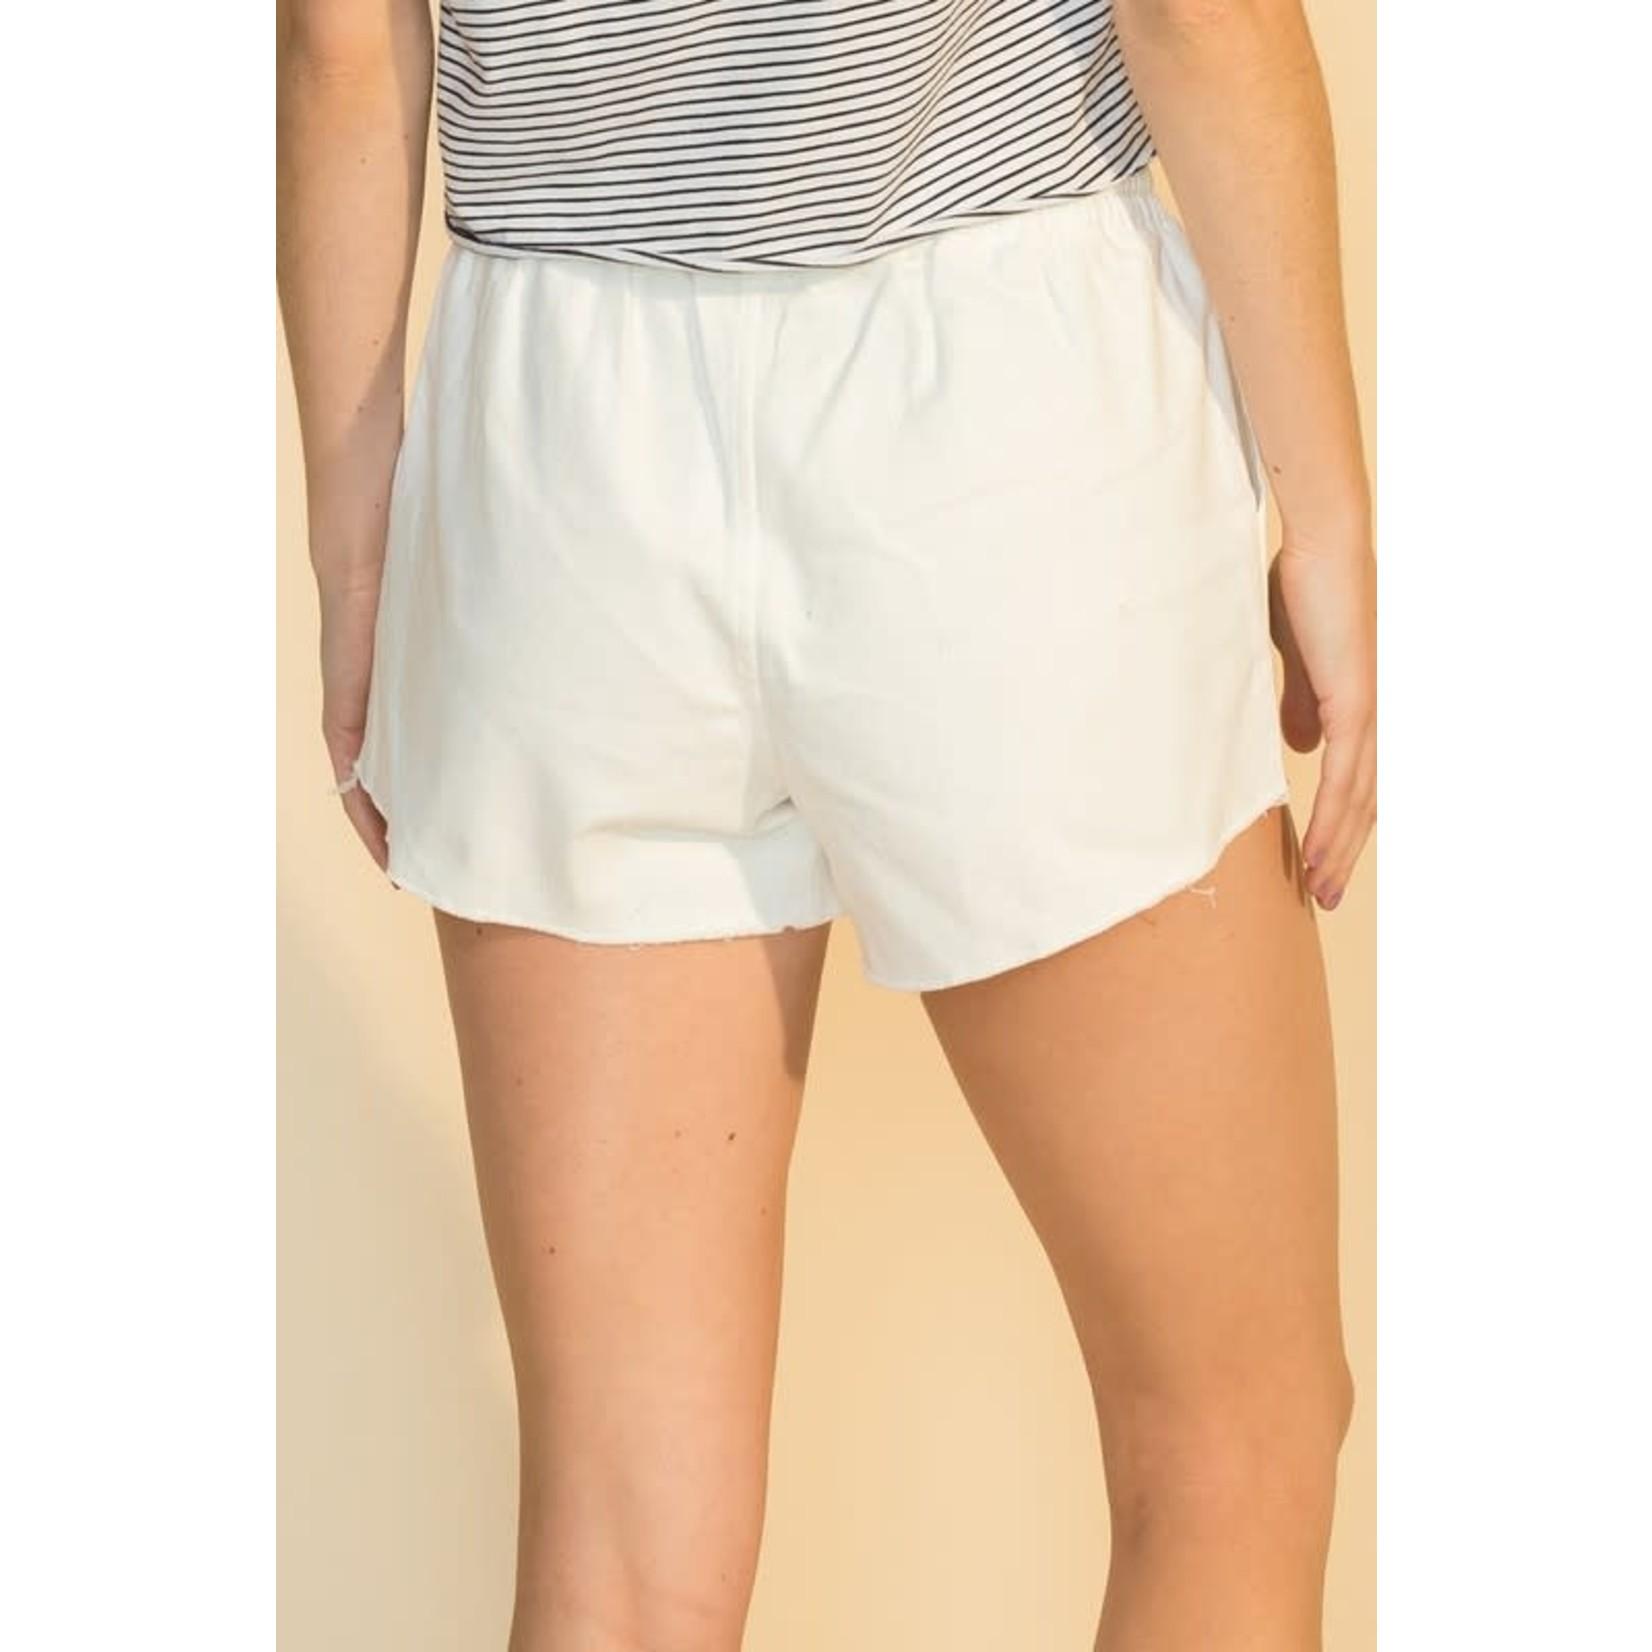 EM & ELLE Camden Drawstring Shorts